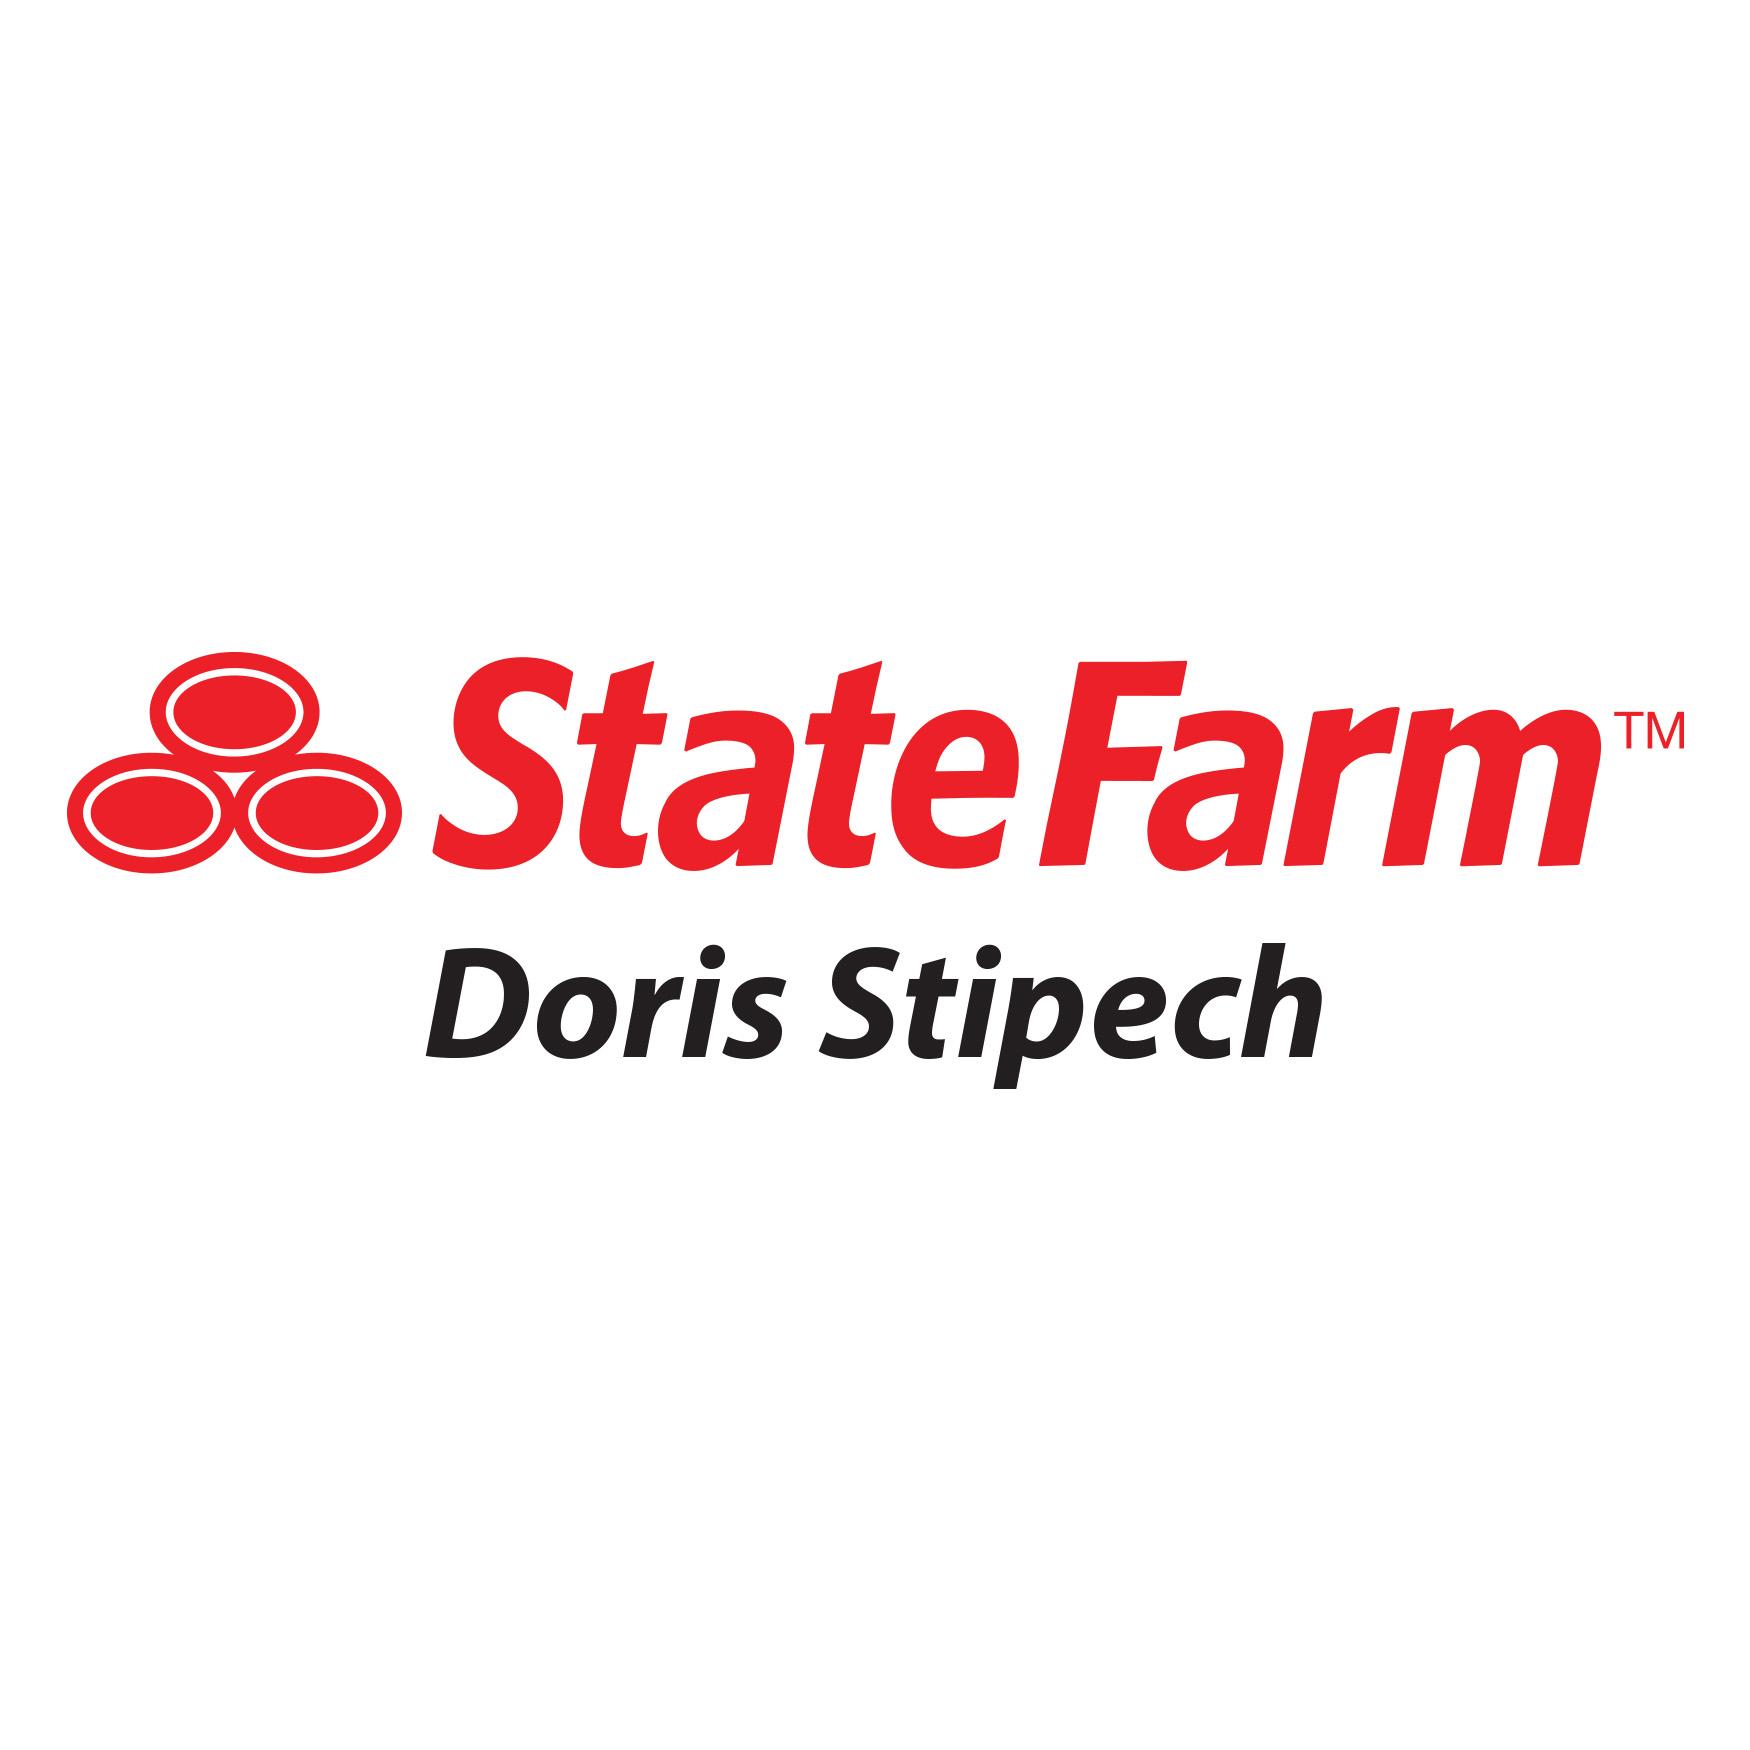 StateFarm_1750pixelsSquare.jpg